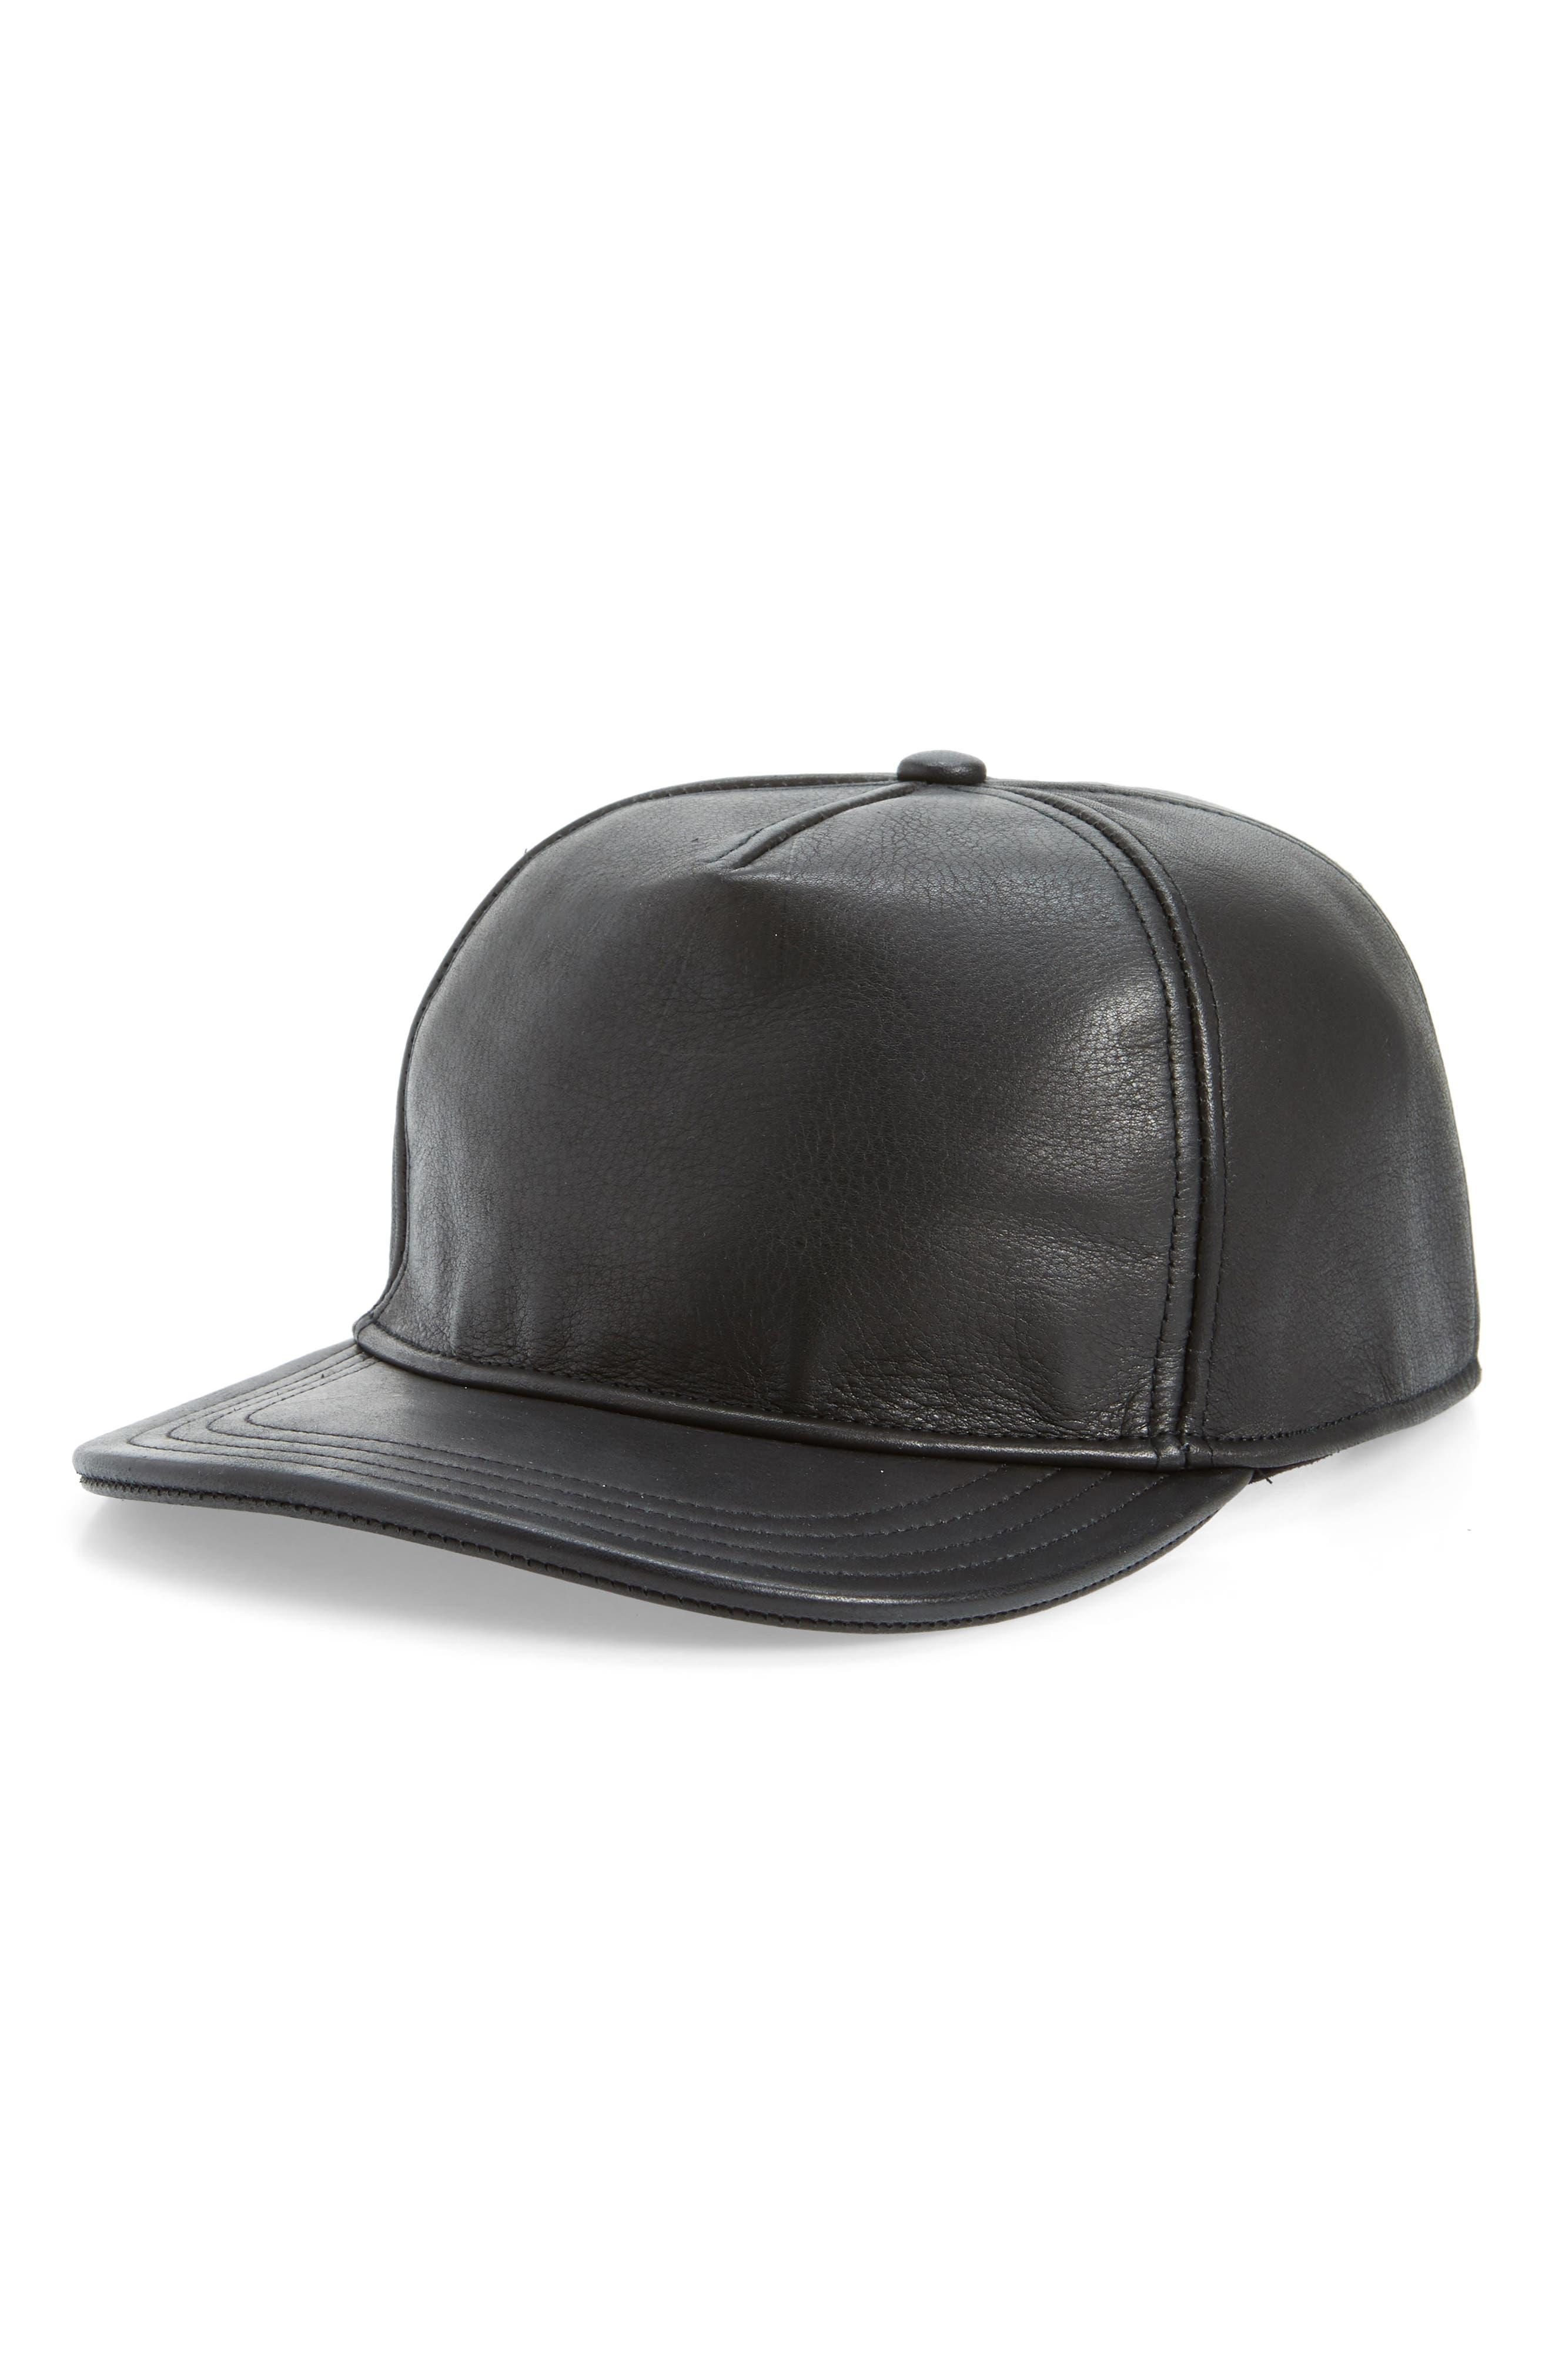 Corner Pocket Leather Baseball Cap,                         Main,                         color, BLACK